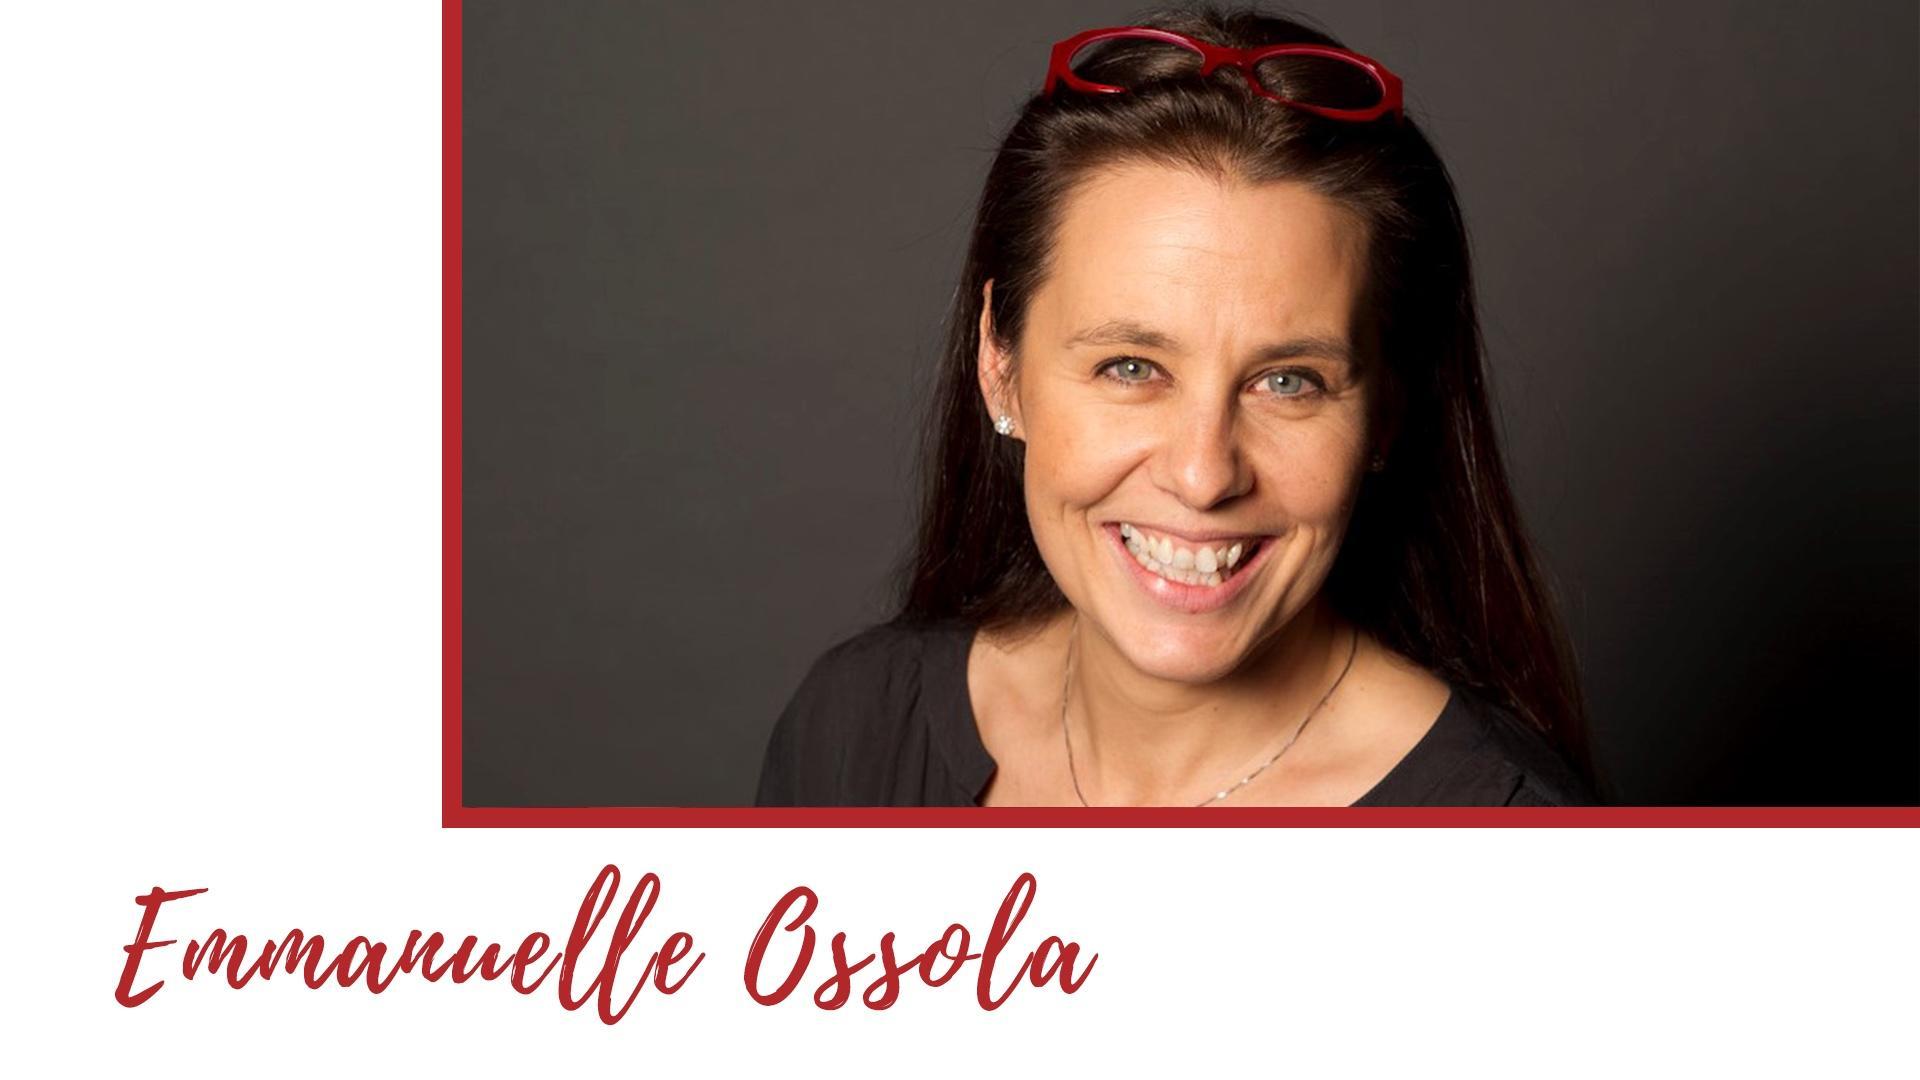 Emmanuelle Ossola - Let it Be